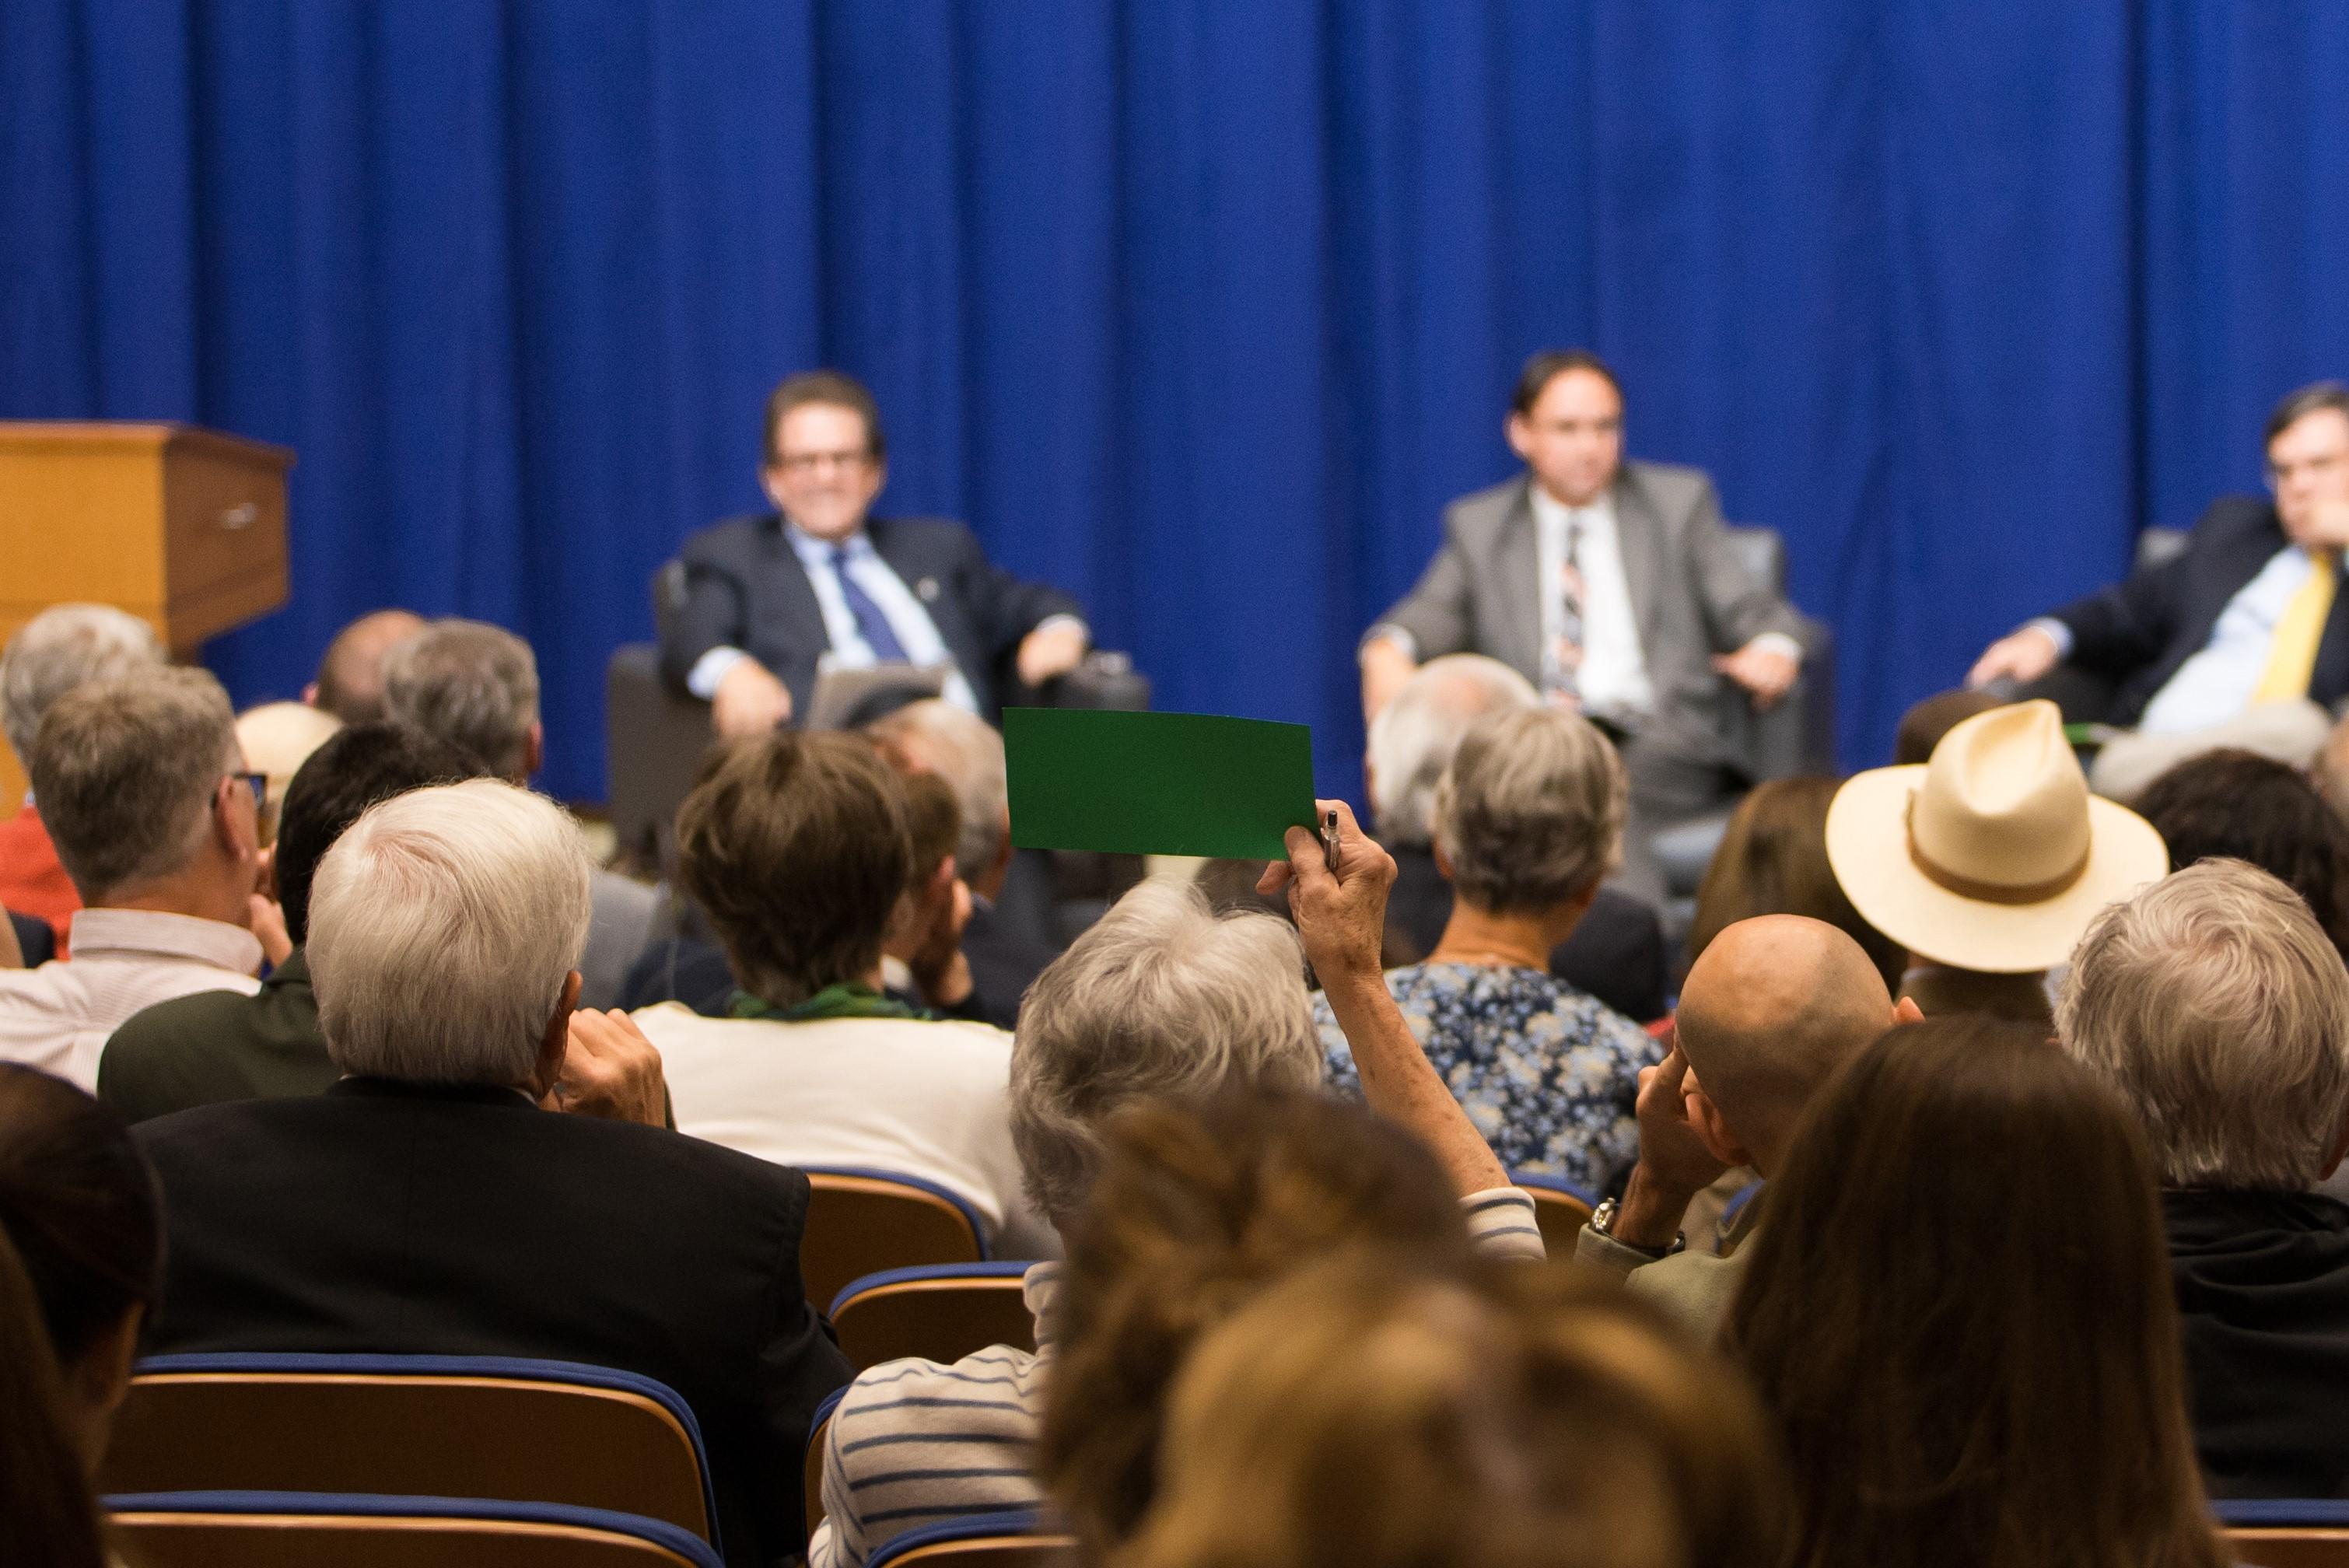 Dr. Arthur Laffer, Jason Bailey & Dr. Chris Bollinger